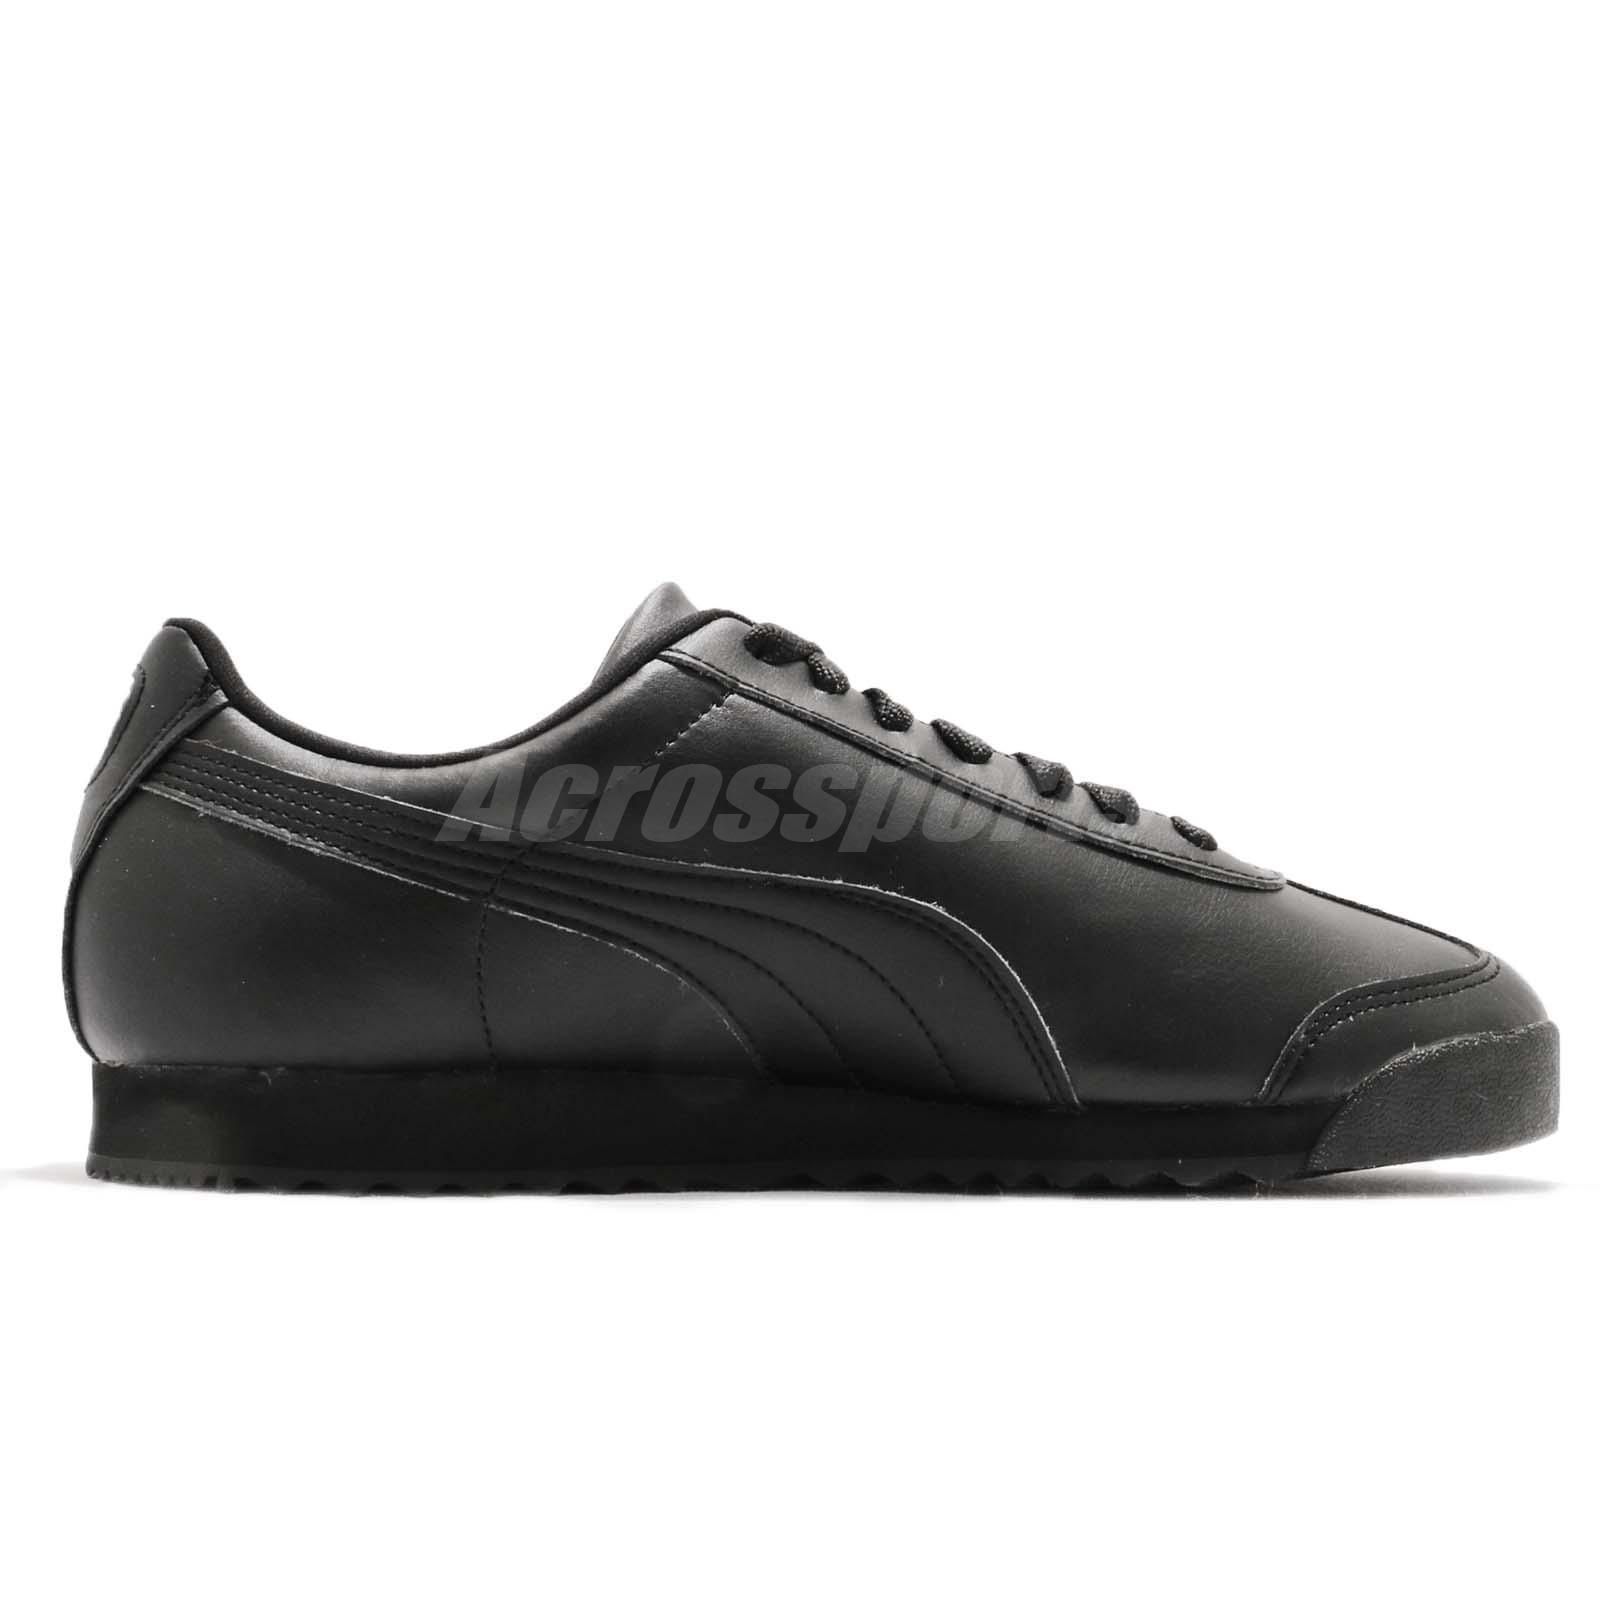 7c1f99c95dc3 Puma Roma Basic Triple Black Men Running Walking Casual Shoes ...